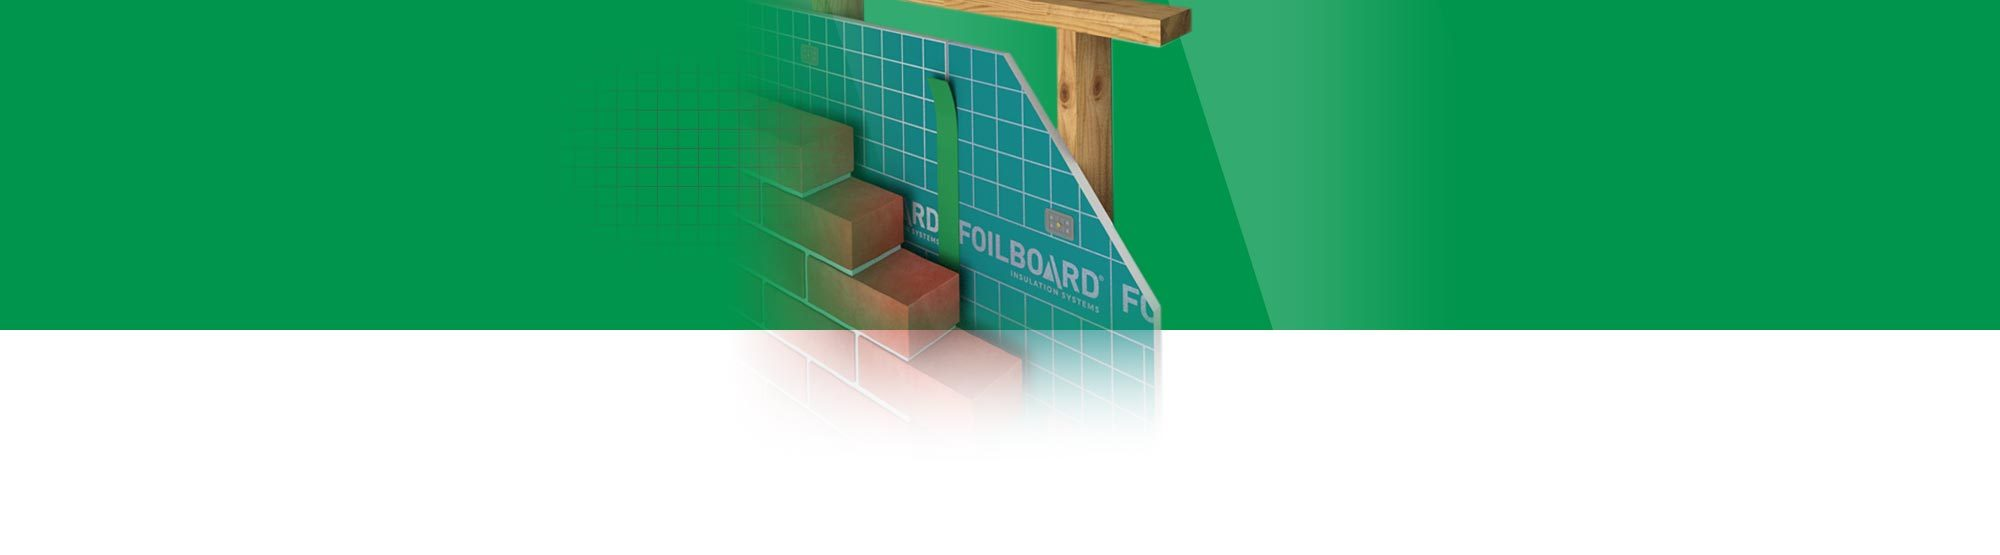 cavity wall insulation perth